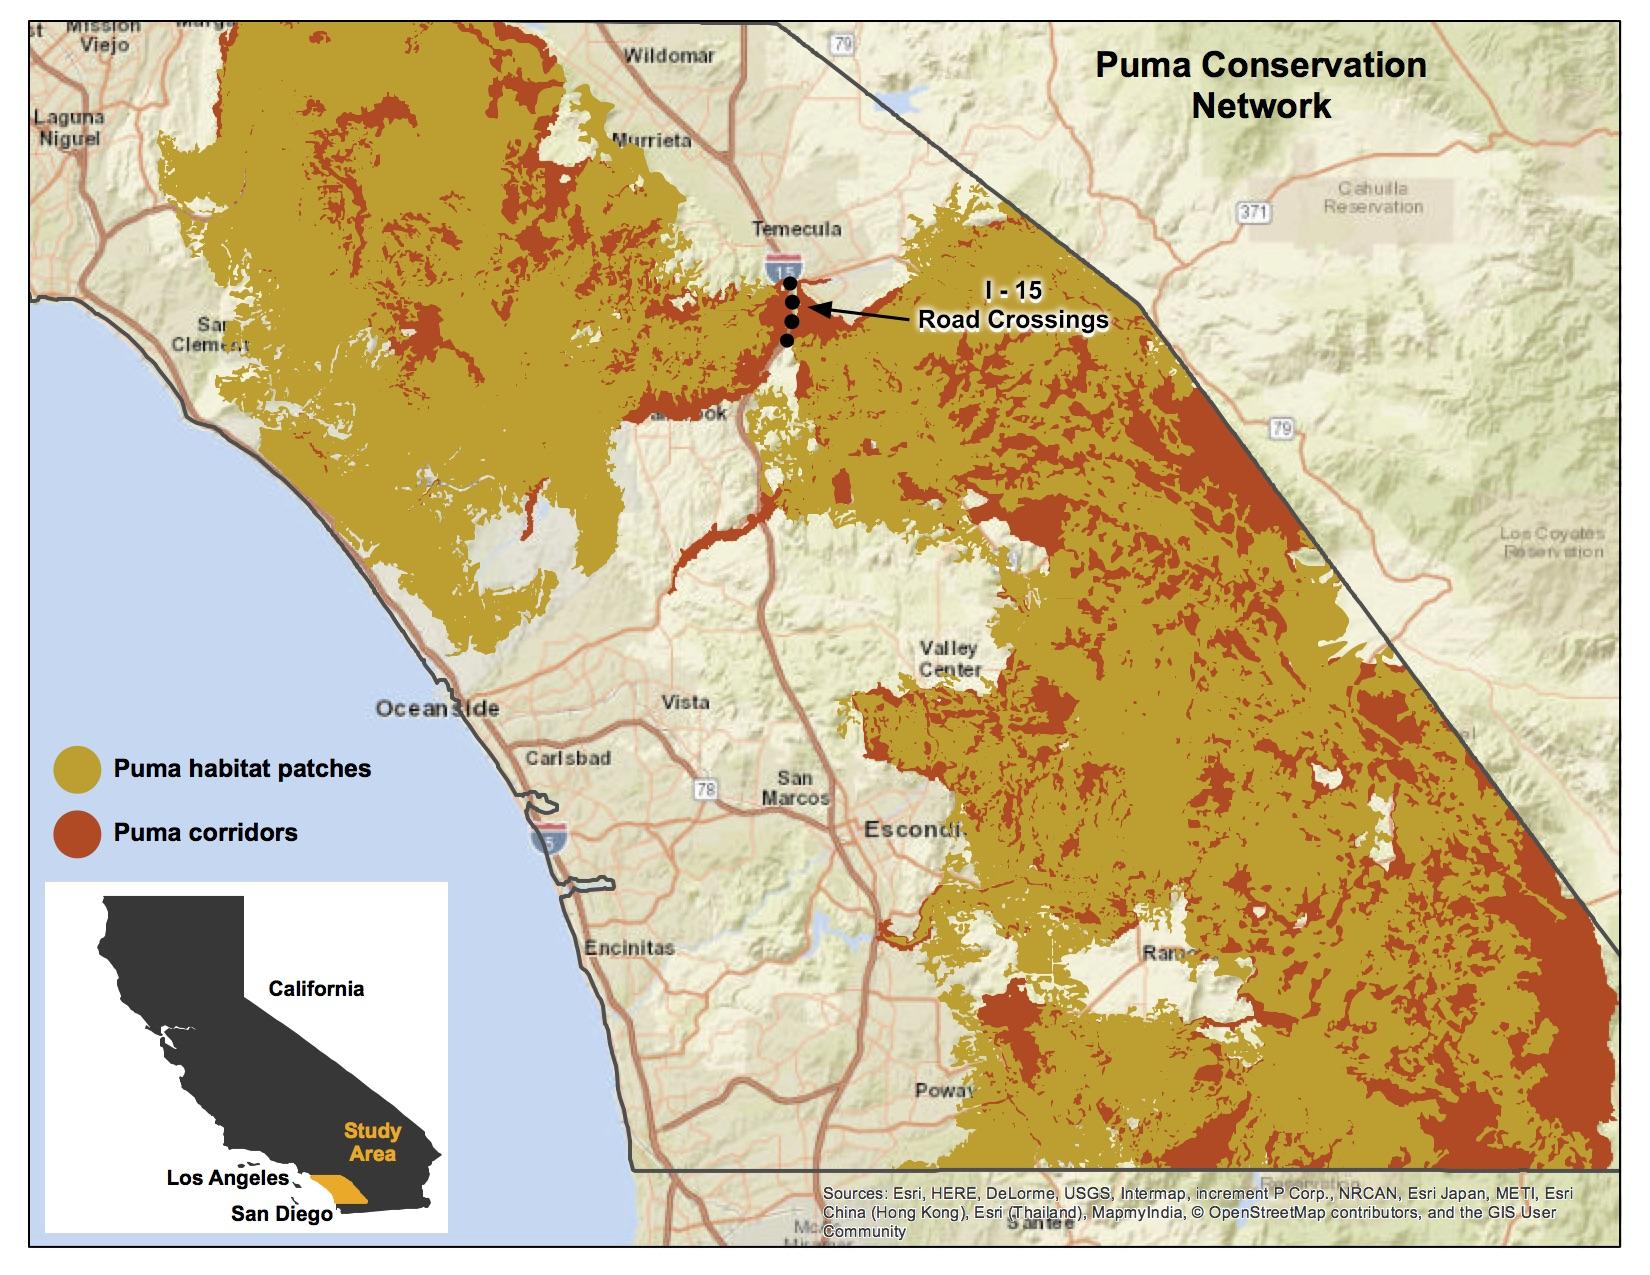 Puma conservation network